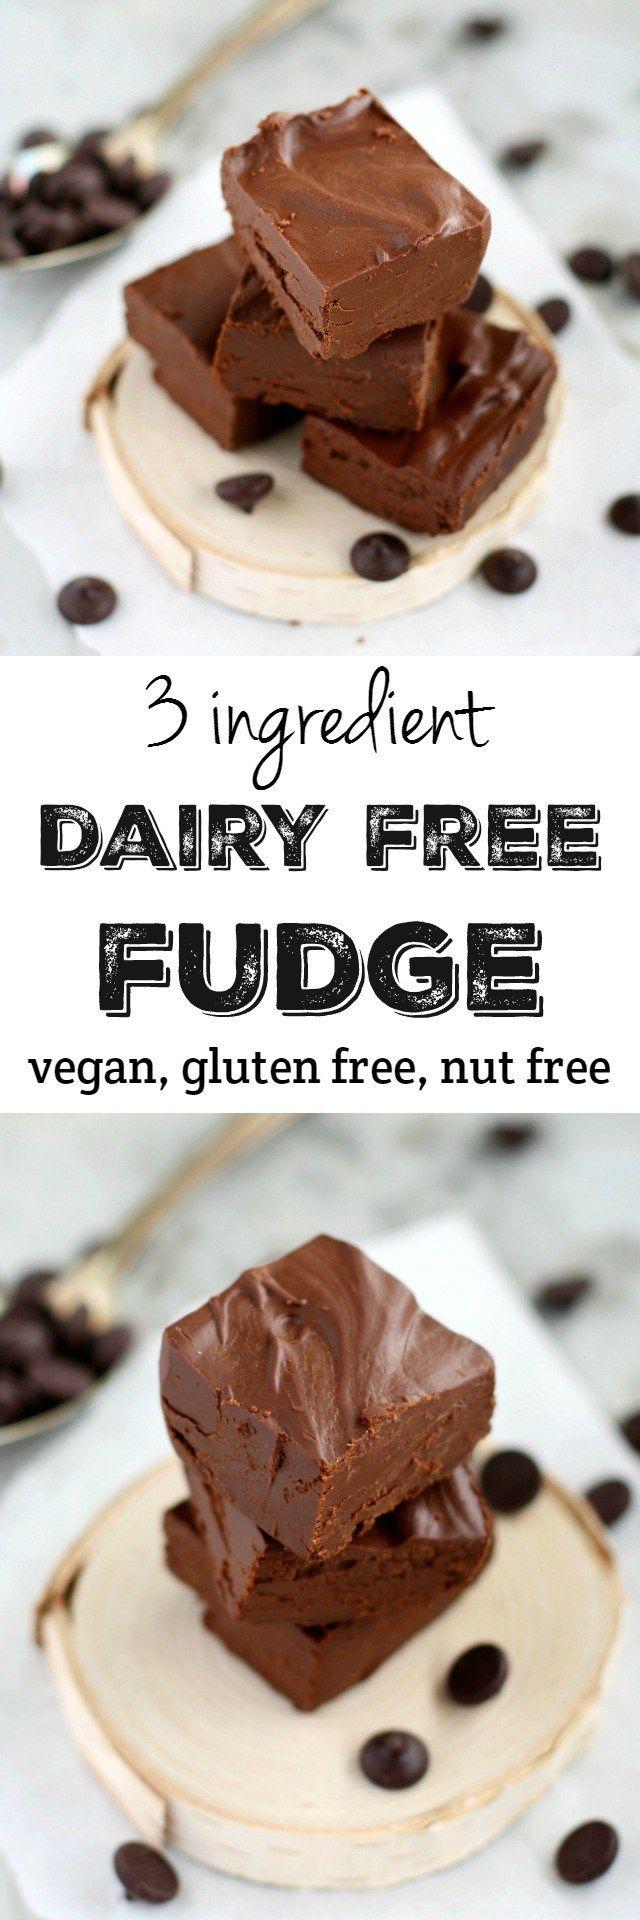 3 Ingredient Dairy Free Fudge